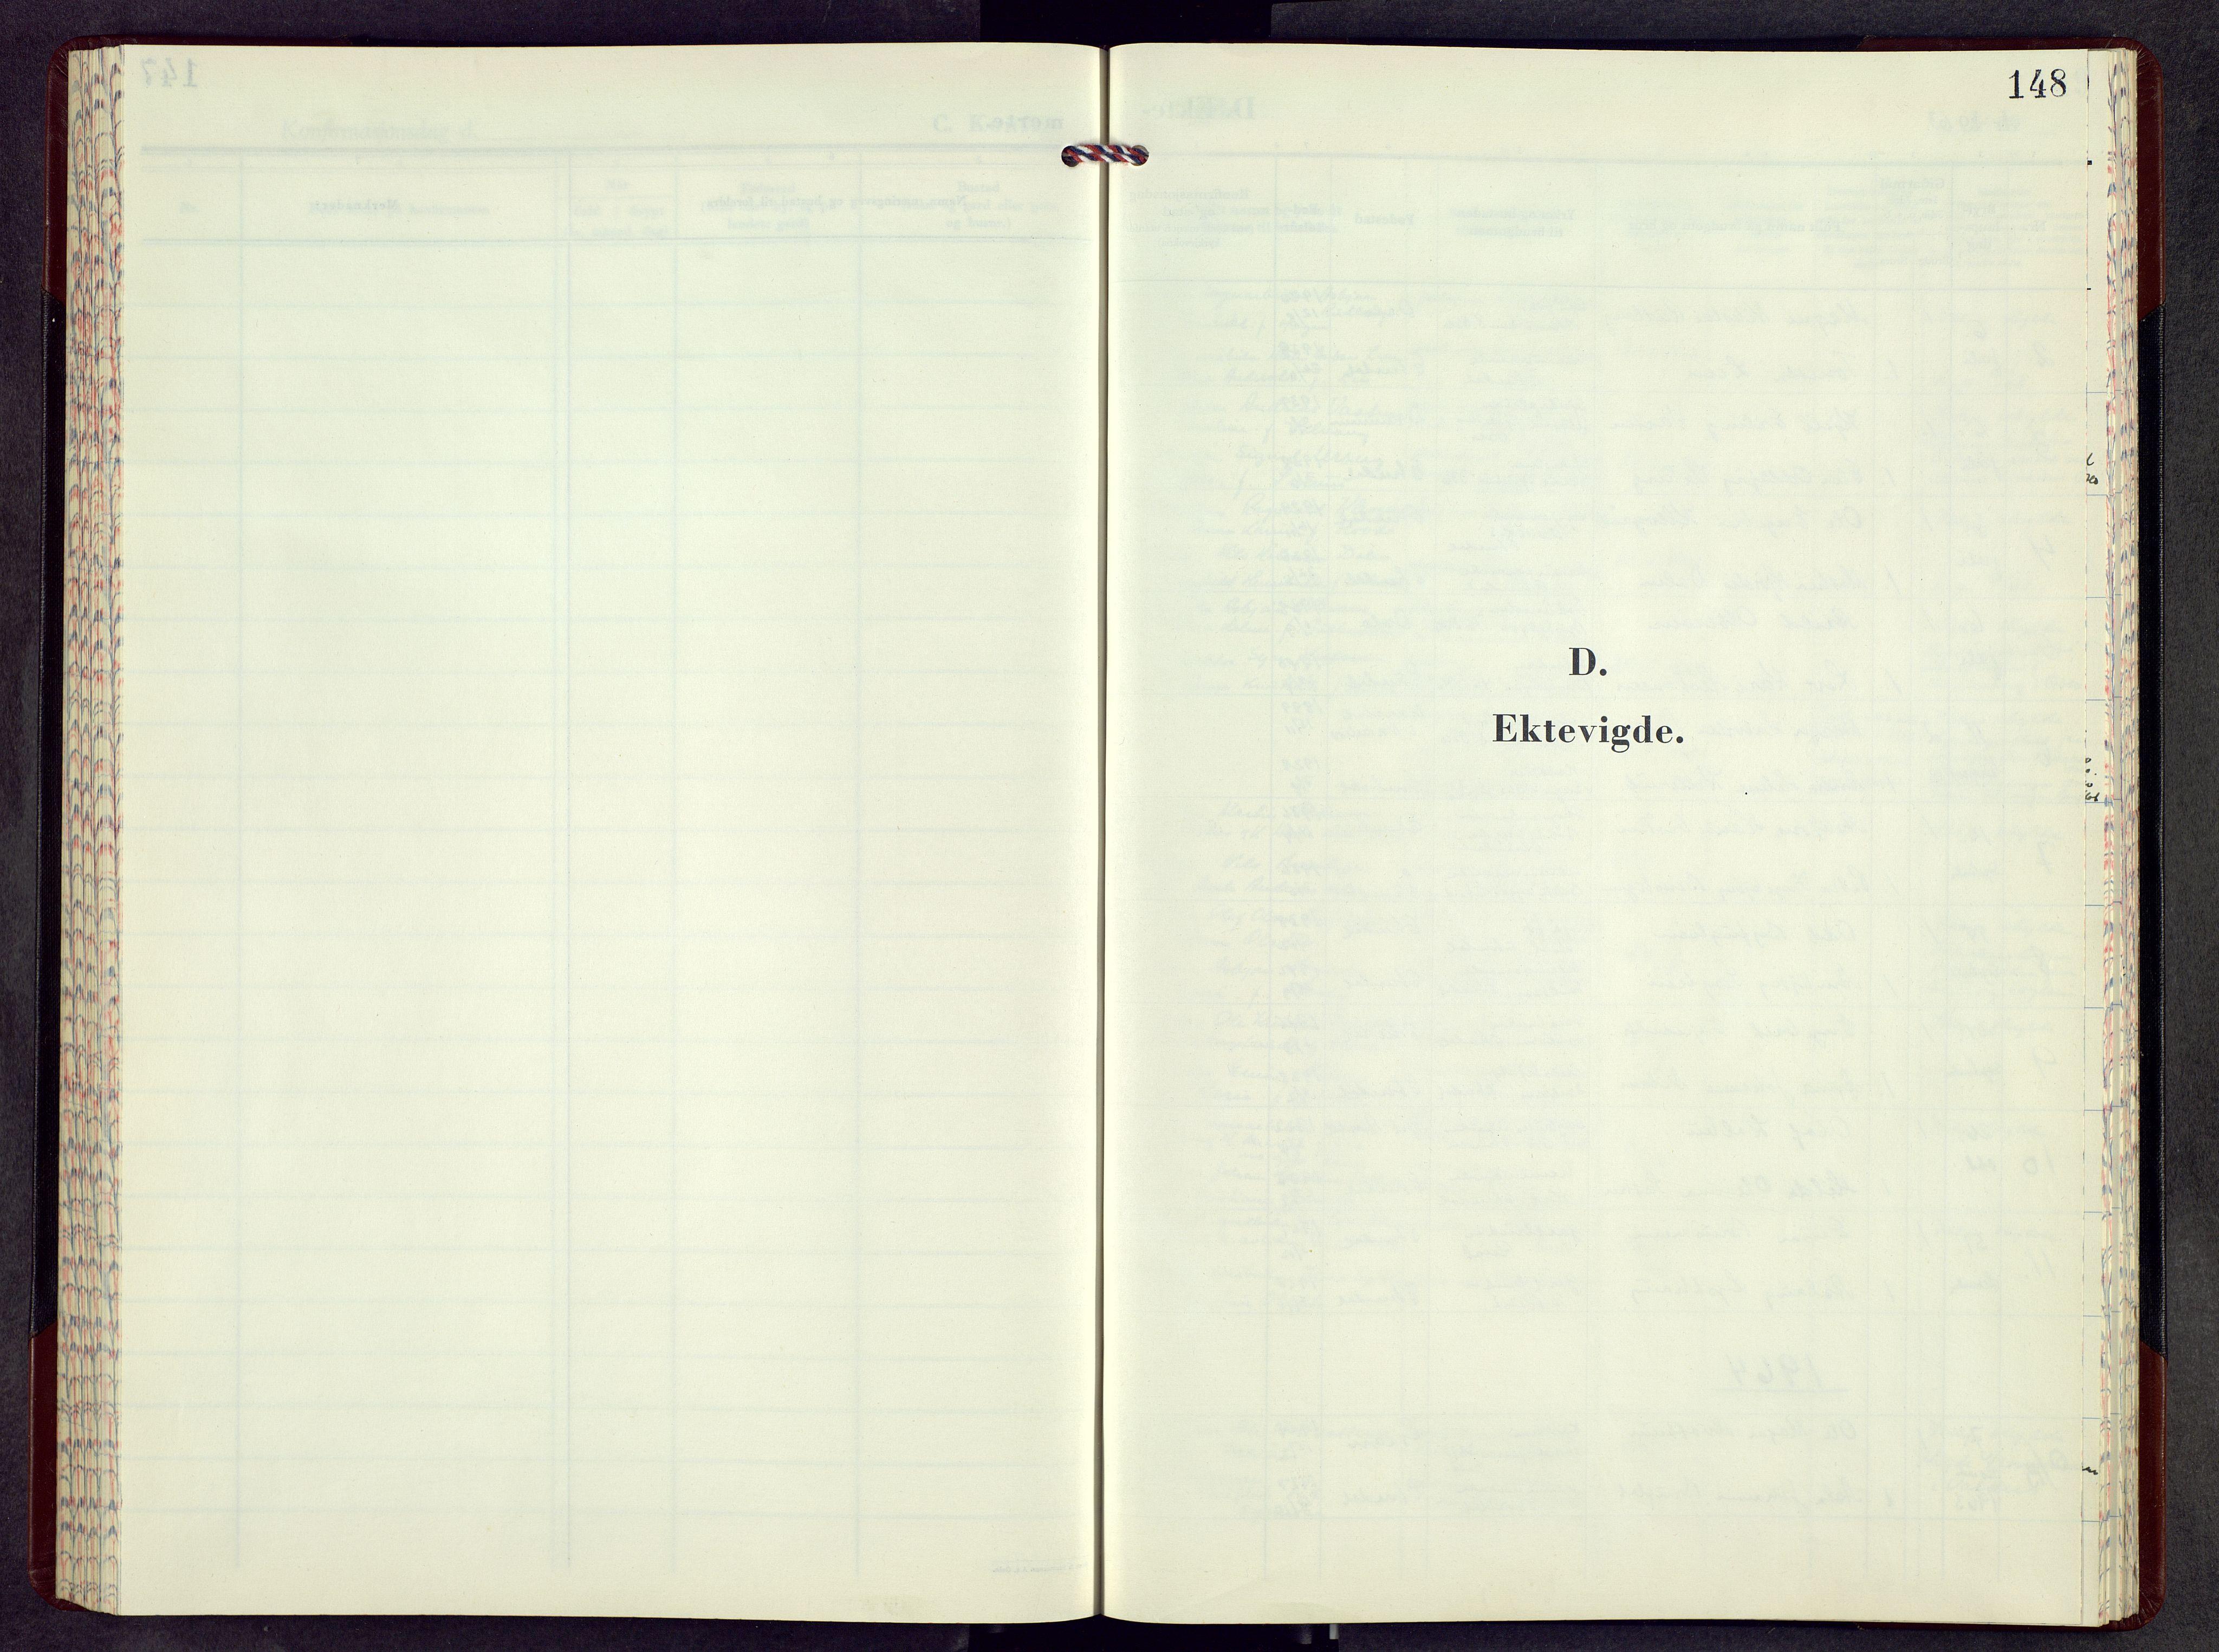 SAH, Etnedal prestekontor, H/Ha/Hab/Haba/L0001: Klokkerbok nr. I 1, 1963-1983, s. 148